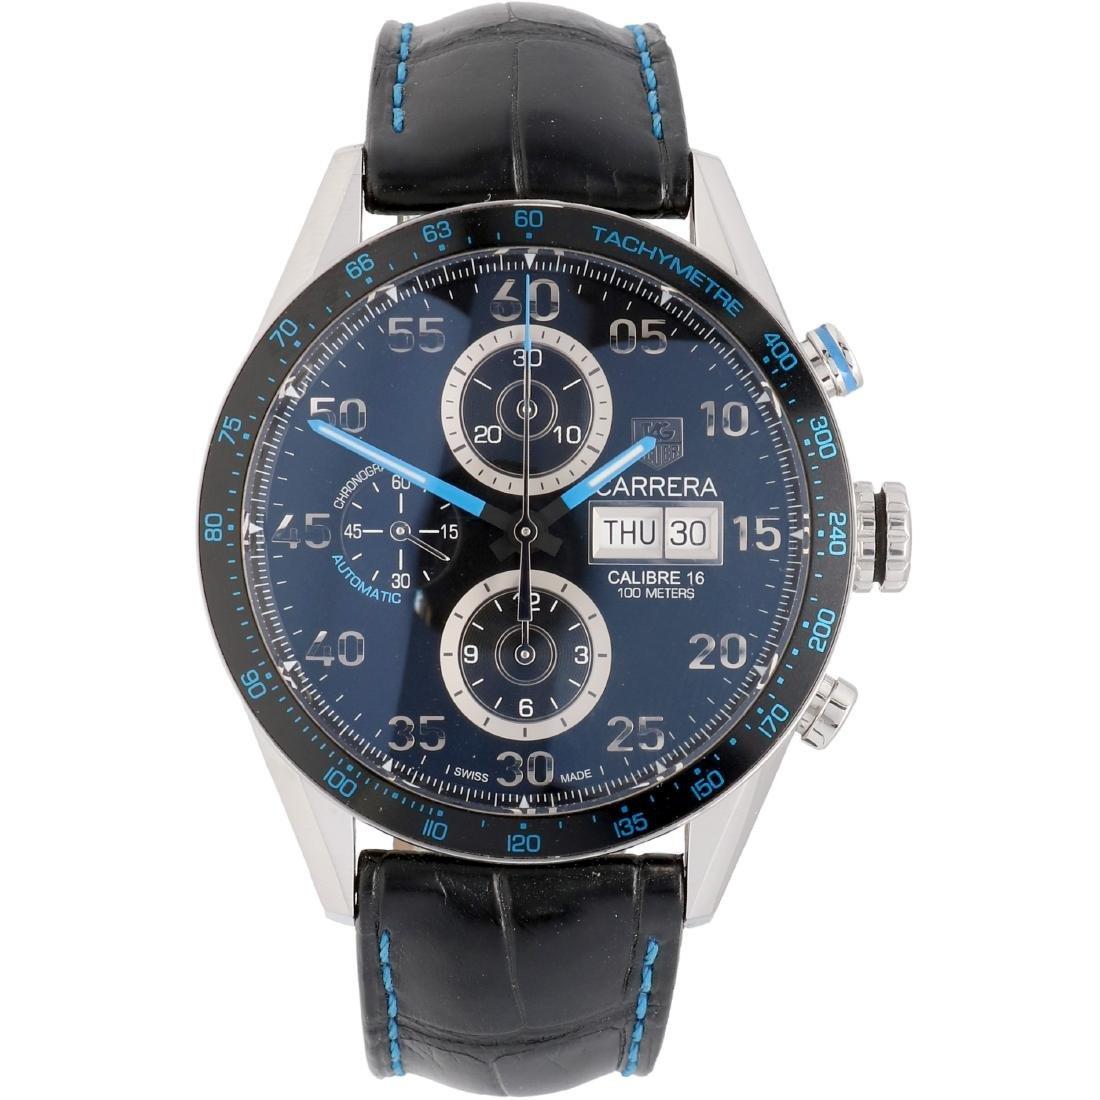 Tag Heuer Carrera CV2A1C - Men's watch - Automatic.